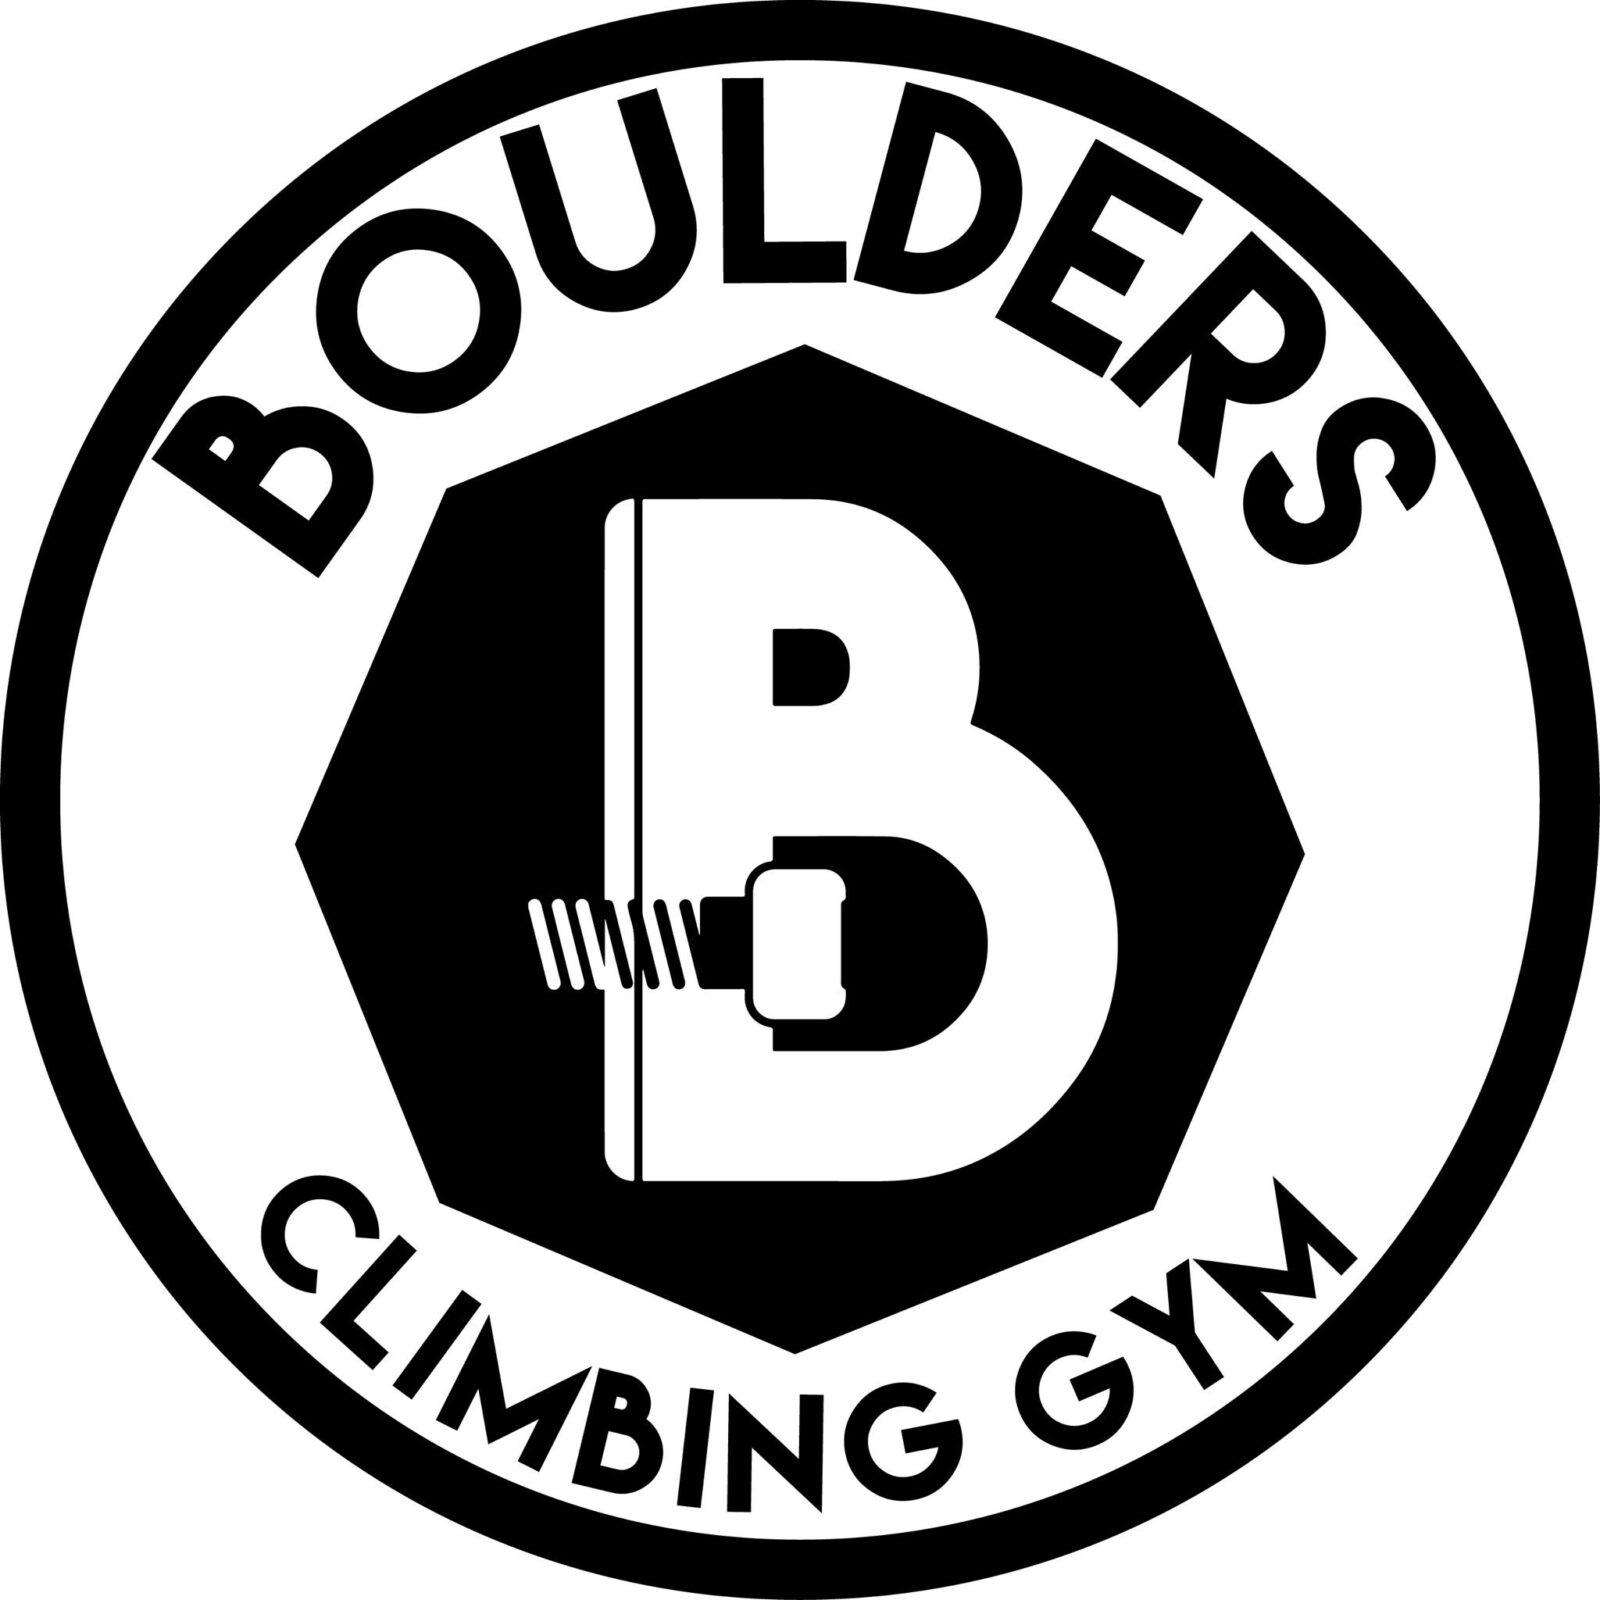 Boulder's Climbing Gym – Downtown